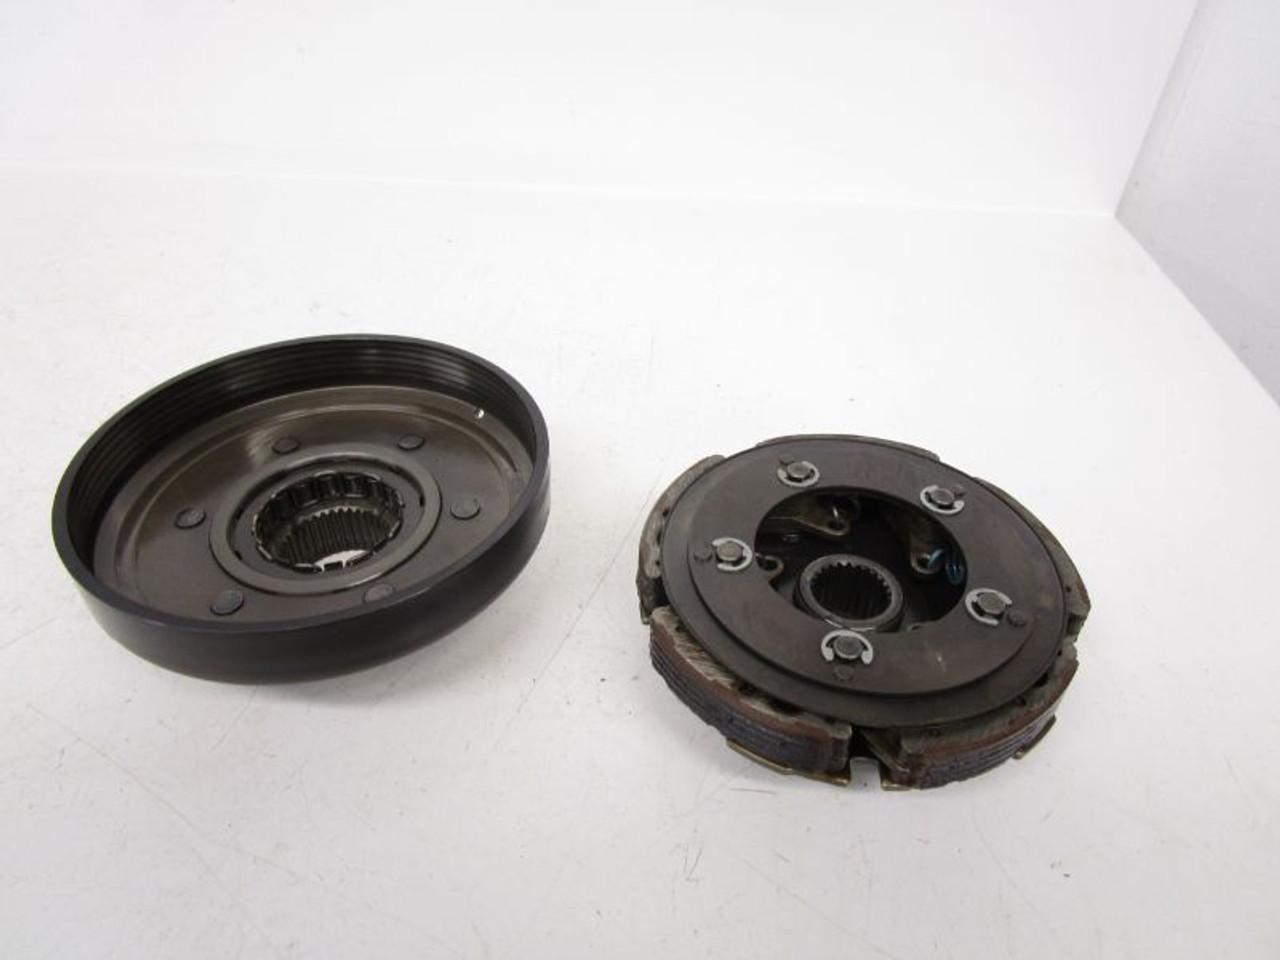 for Honda TRX300 TRX300FW Fourtrax 300 1988-2000 Centrifugal Clutch and Bearing